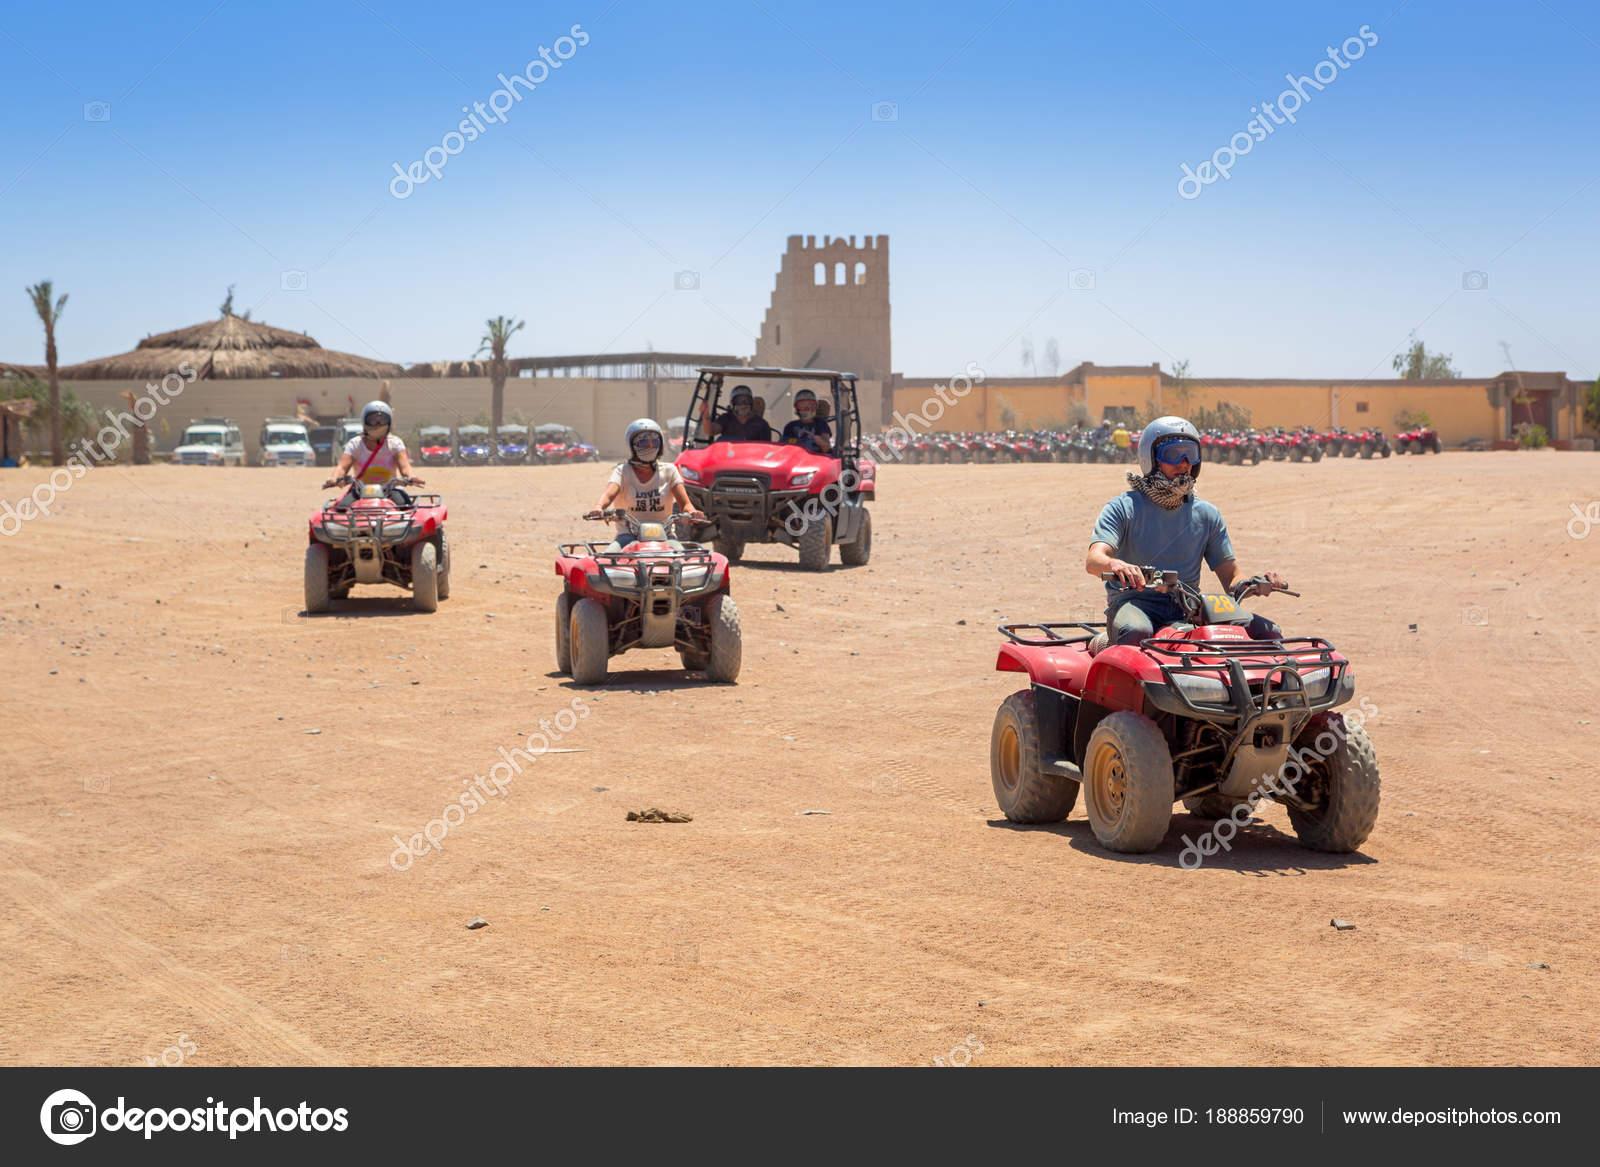 Hurghada Egypt April 2013 Quad Trip African Desert Hurghada Egypt Stock Editorial Photo C Patryk Kosmider 188859790